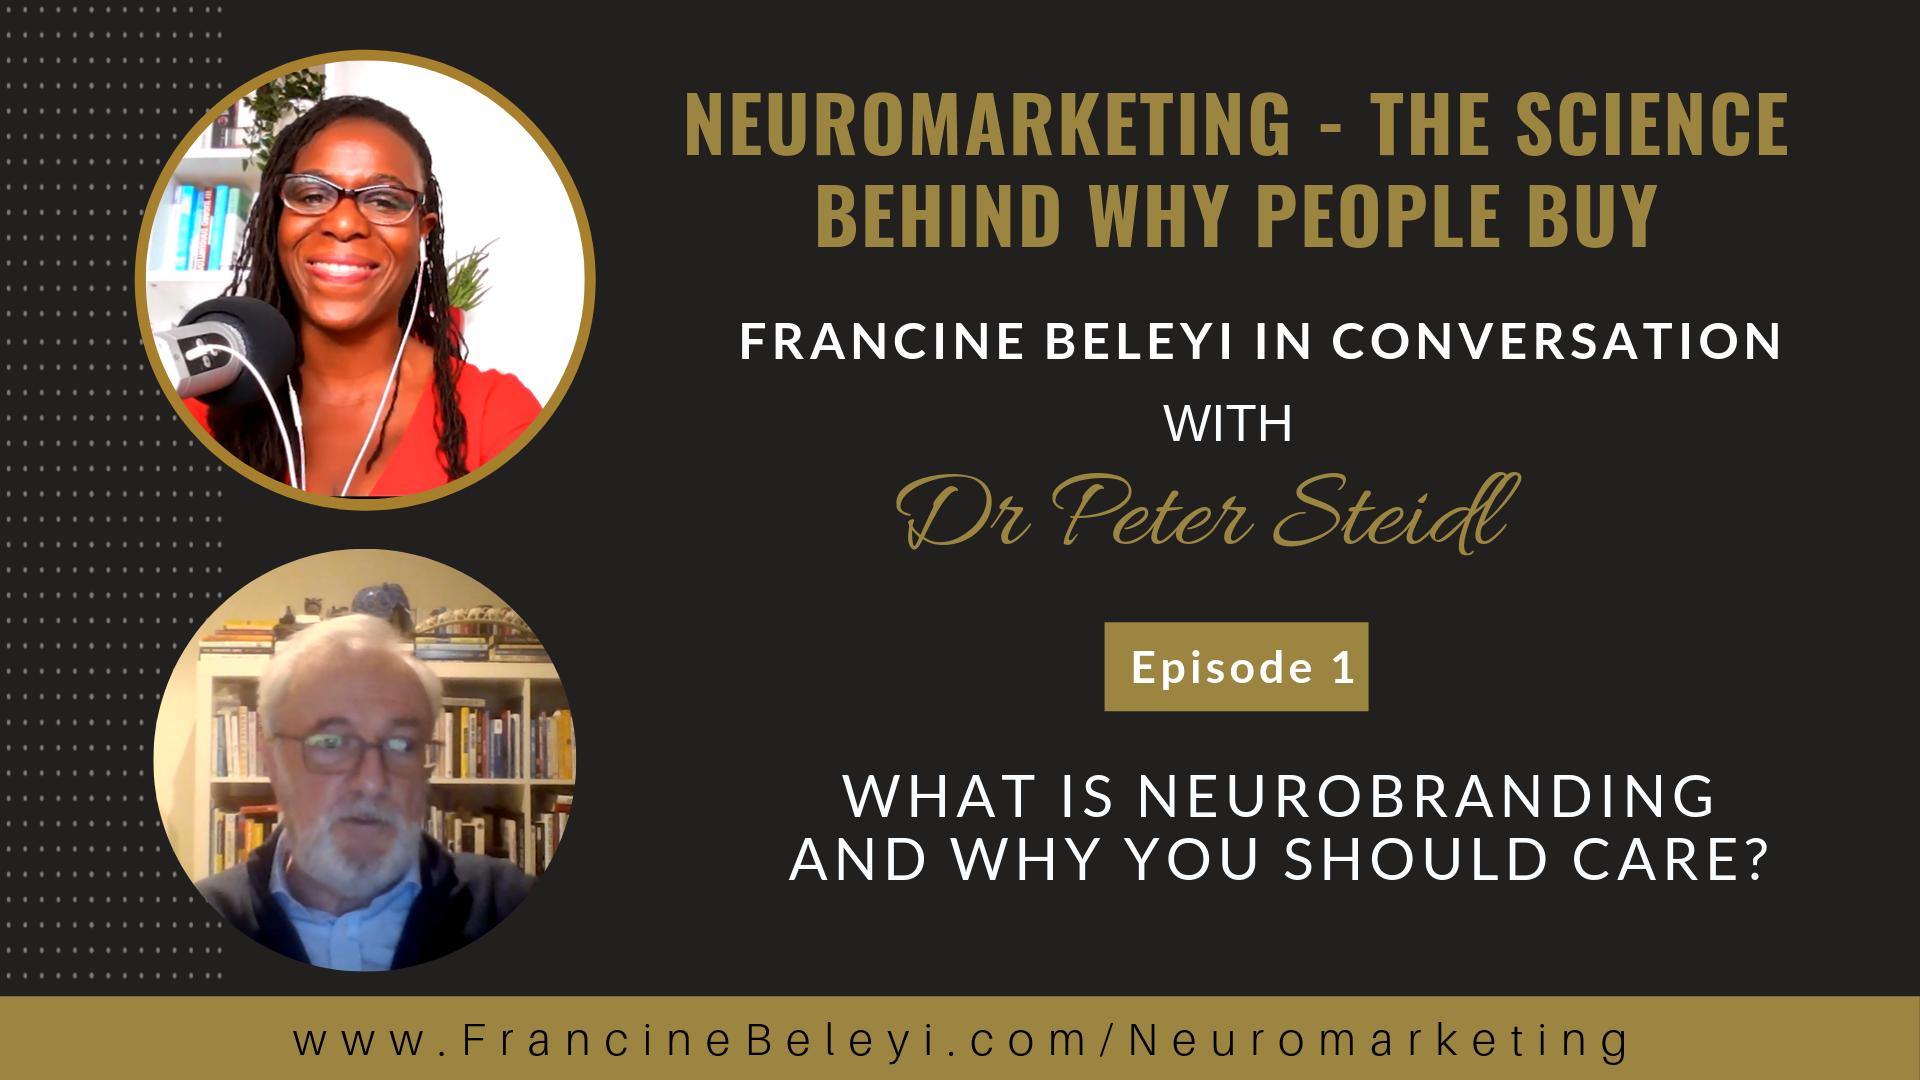 Neuromarketing episode 1 - Francine Beleyi & Dr Peter Steidl